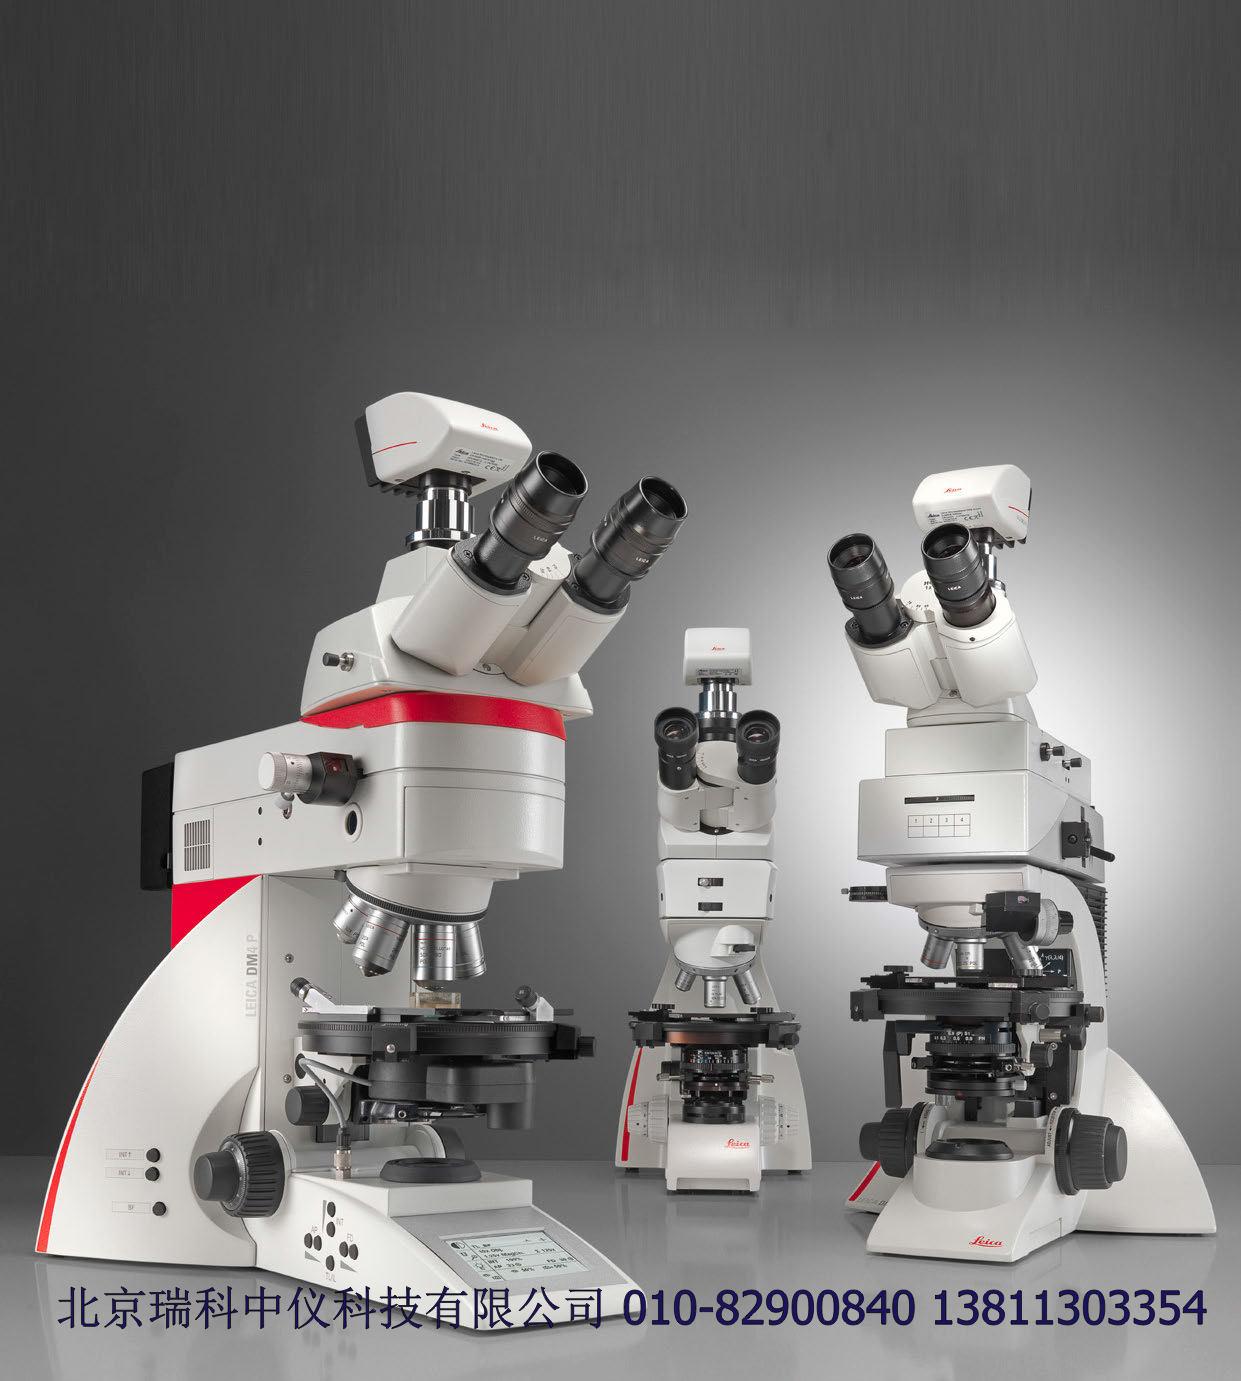 leica徕卡dm4pdm2700p和dm750p正置偏光显微镜